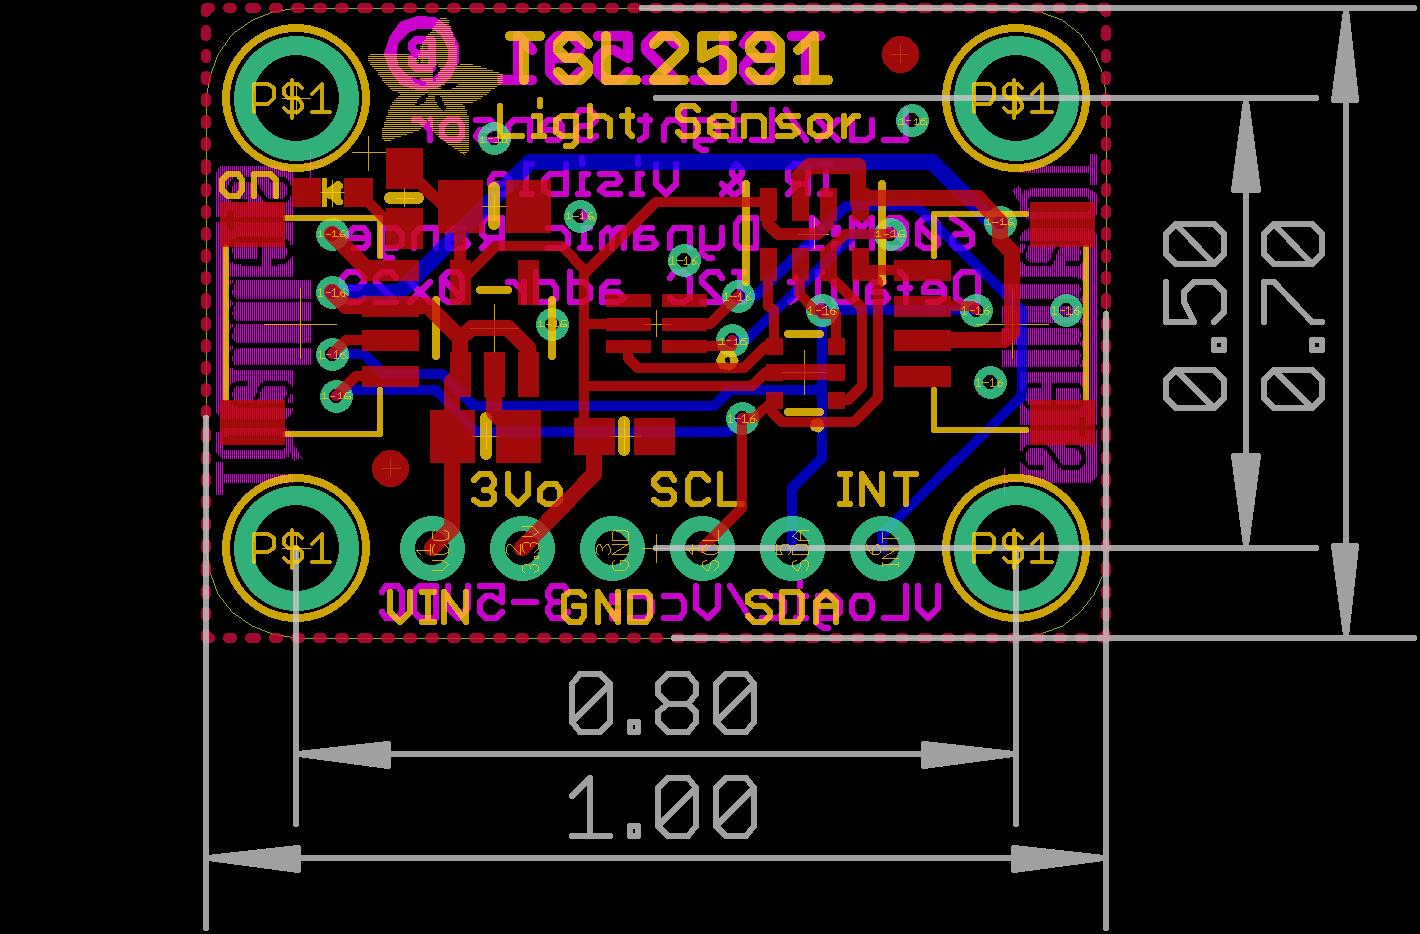 adafruit_products_TSL2591_fab_print.png